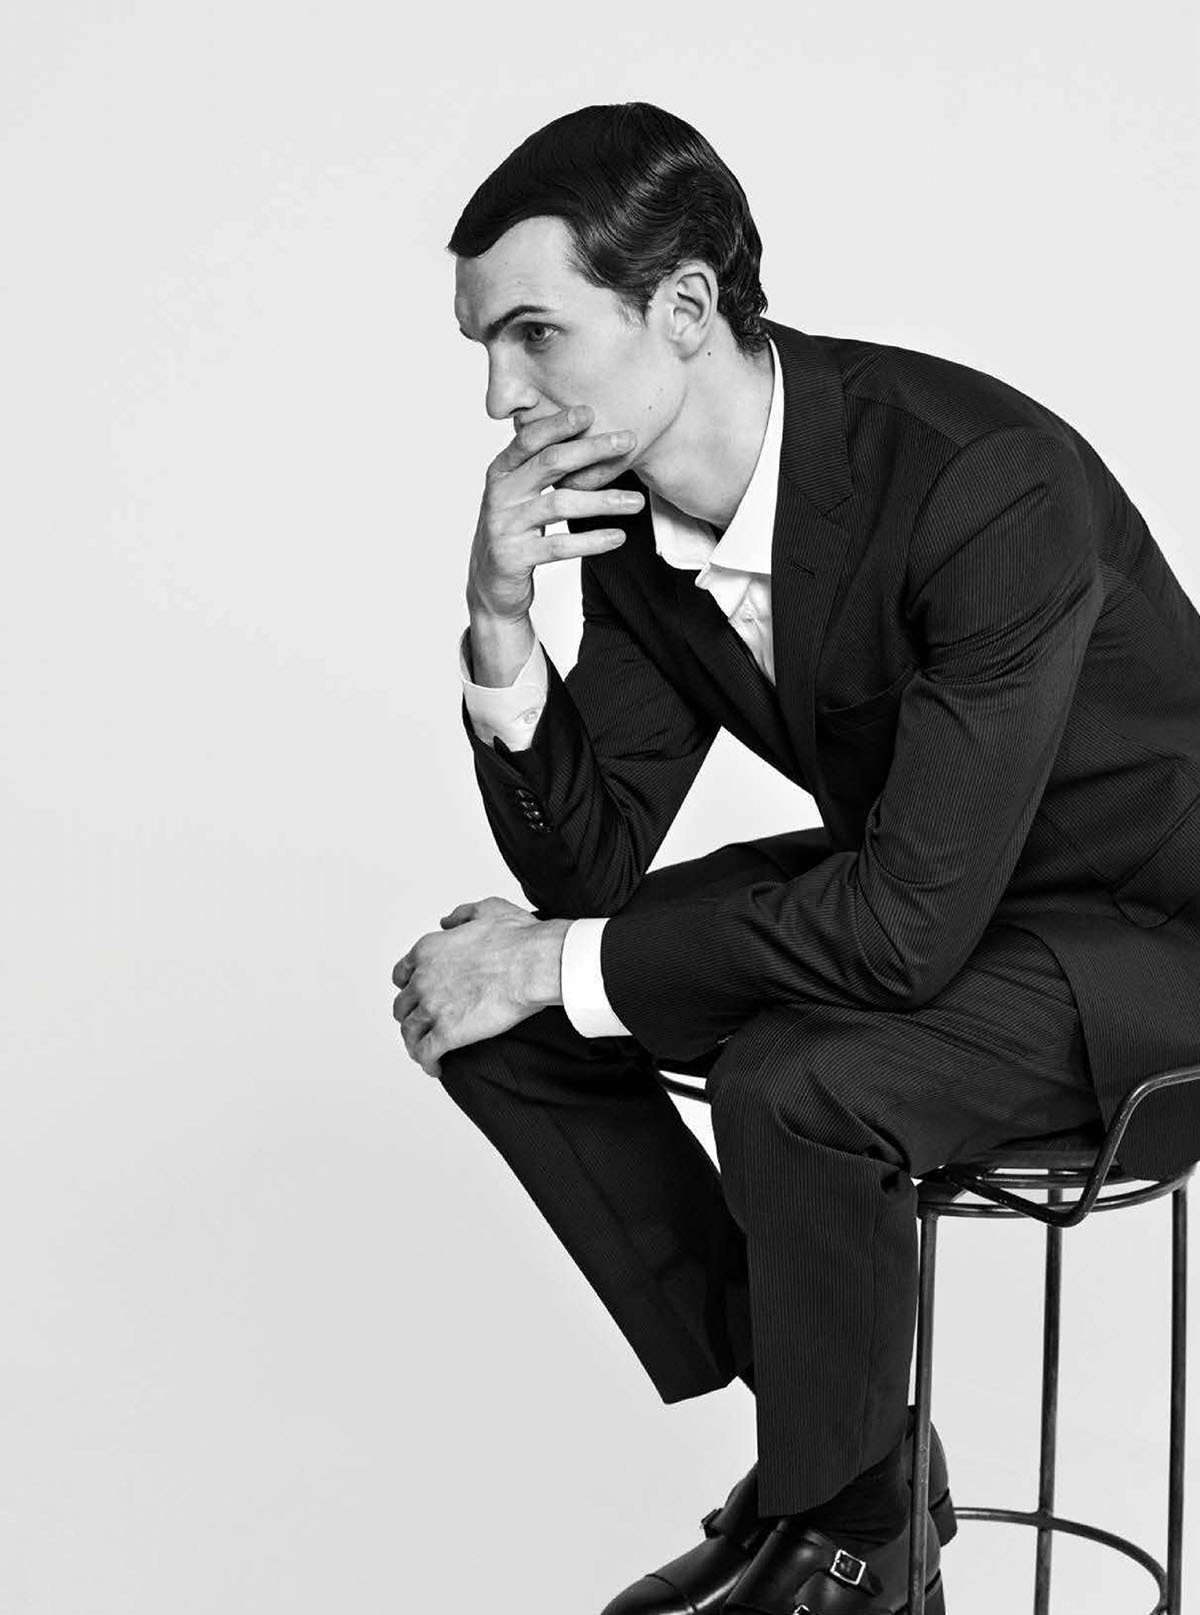 Luc Defont-Saviard by Joseph Degbadjo for GQ Mexico & Latin America April 2021